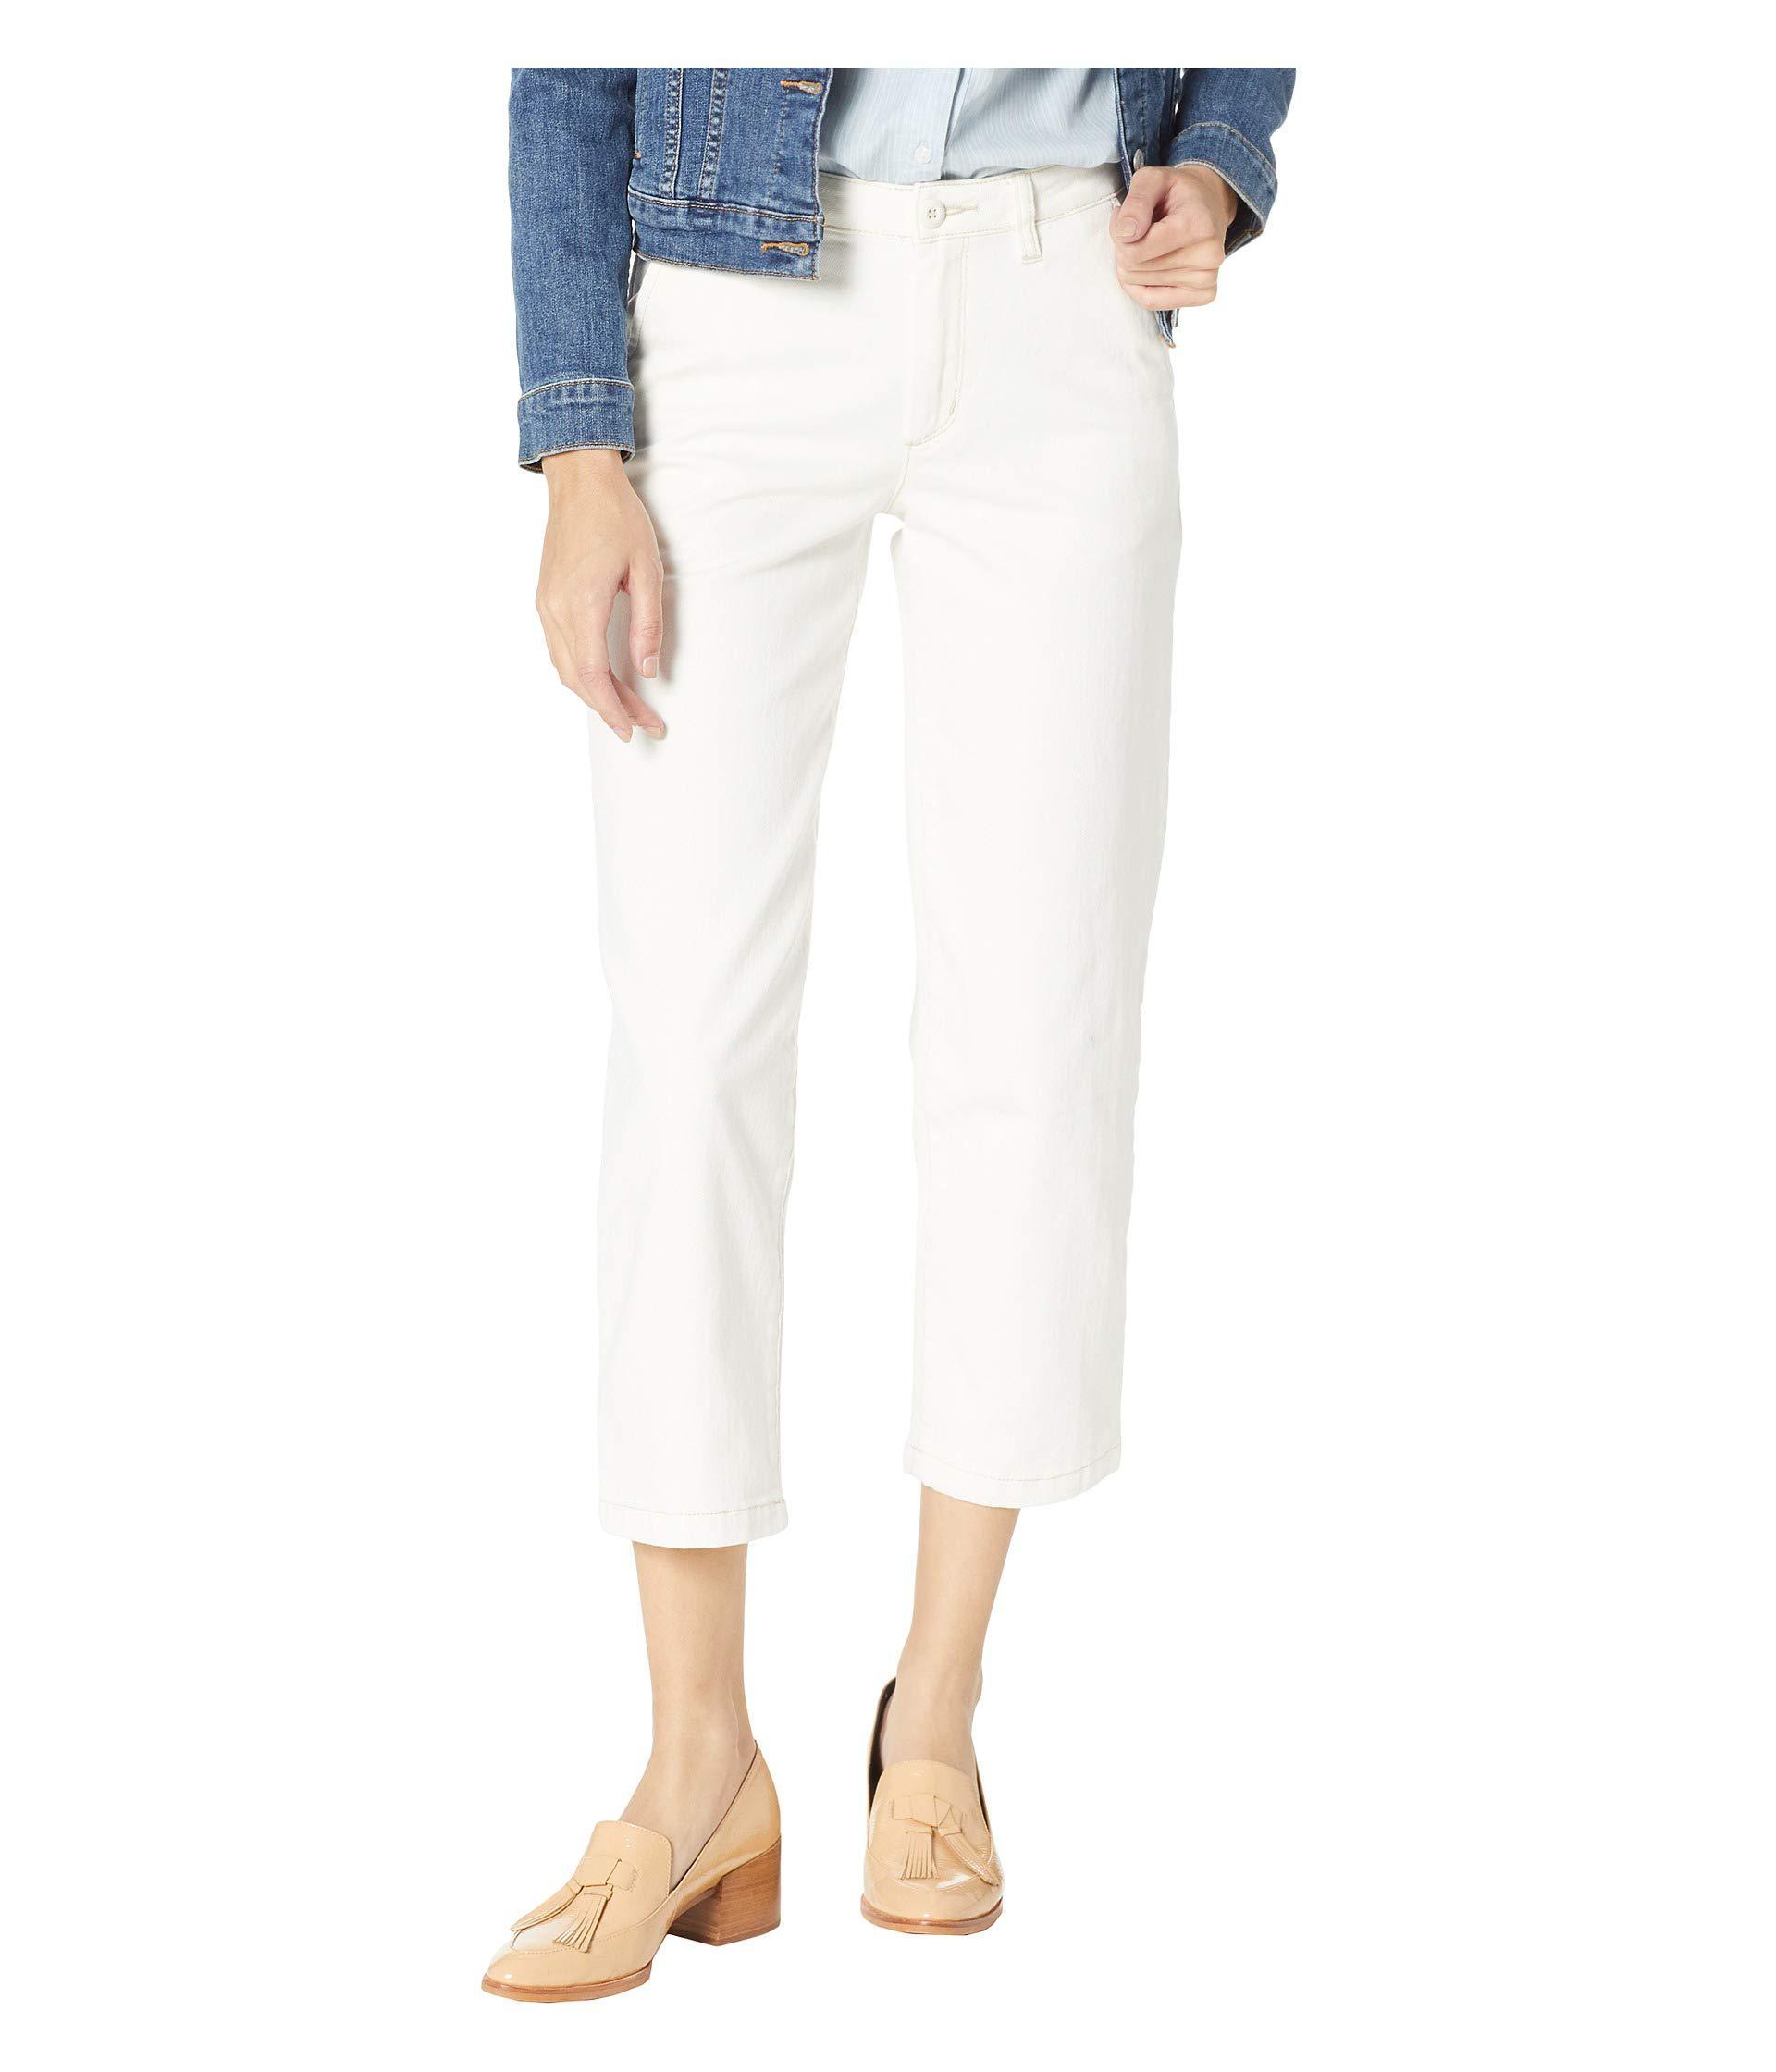 d440aae1046 Lyst - Vans Junction Pants (marshmallow) Women s Casual Pants in White